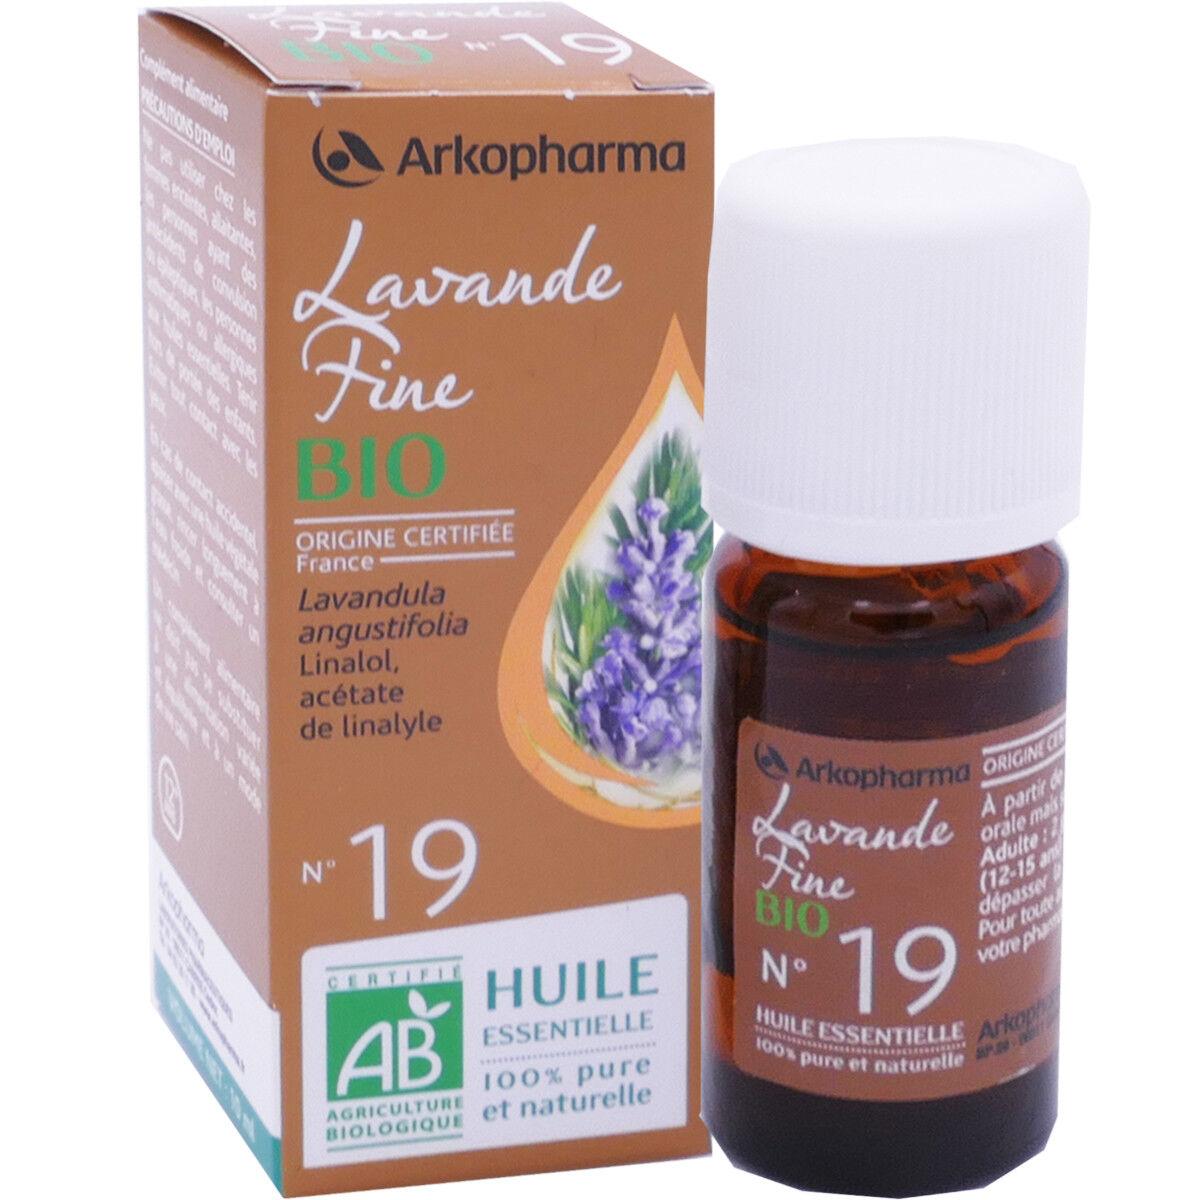 Arkopharma huile essentielle lavande fine bio n°19 10 ml